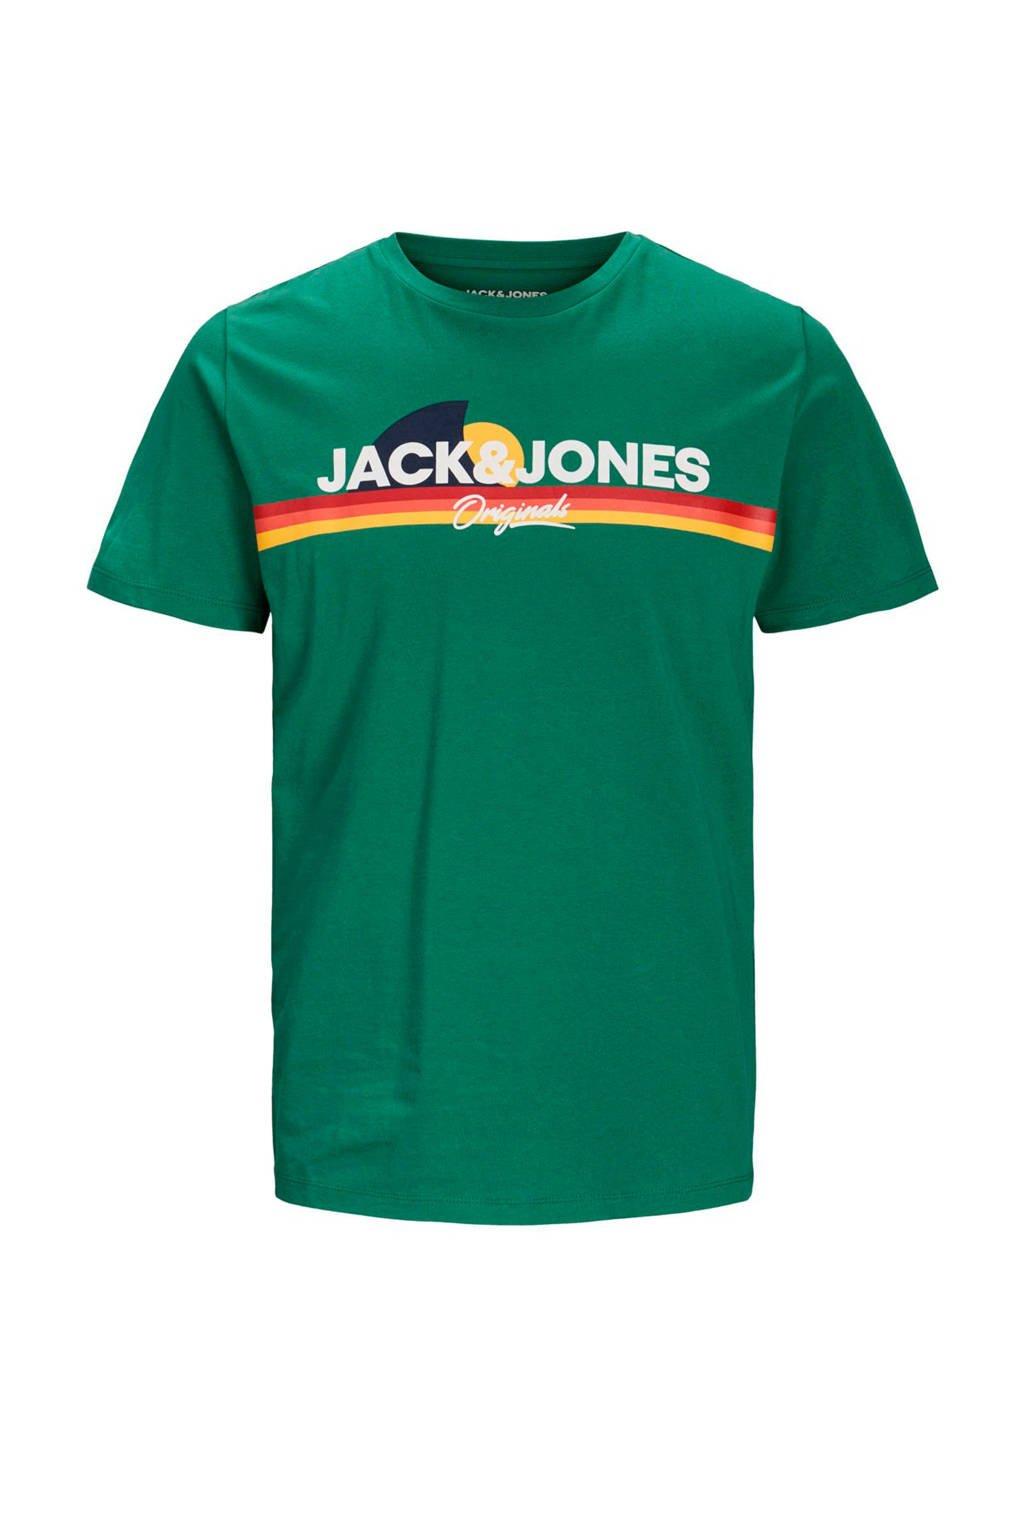 JACK & JONES JUNIOR T-shirt Venture met logo groen/multi, Groen/multi